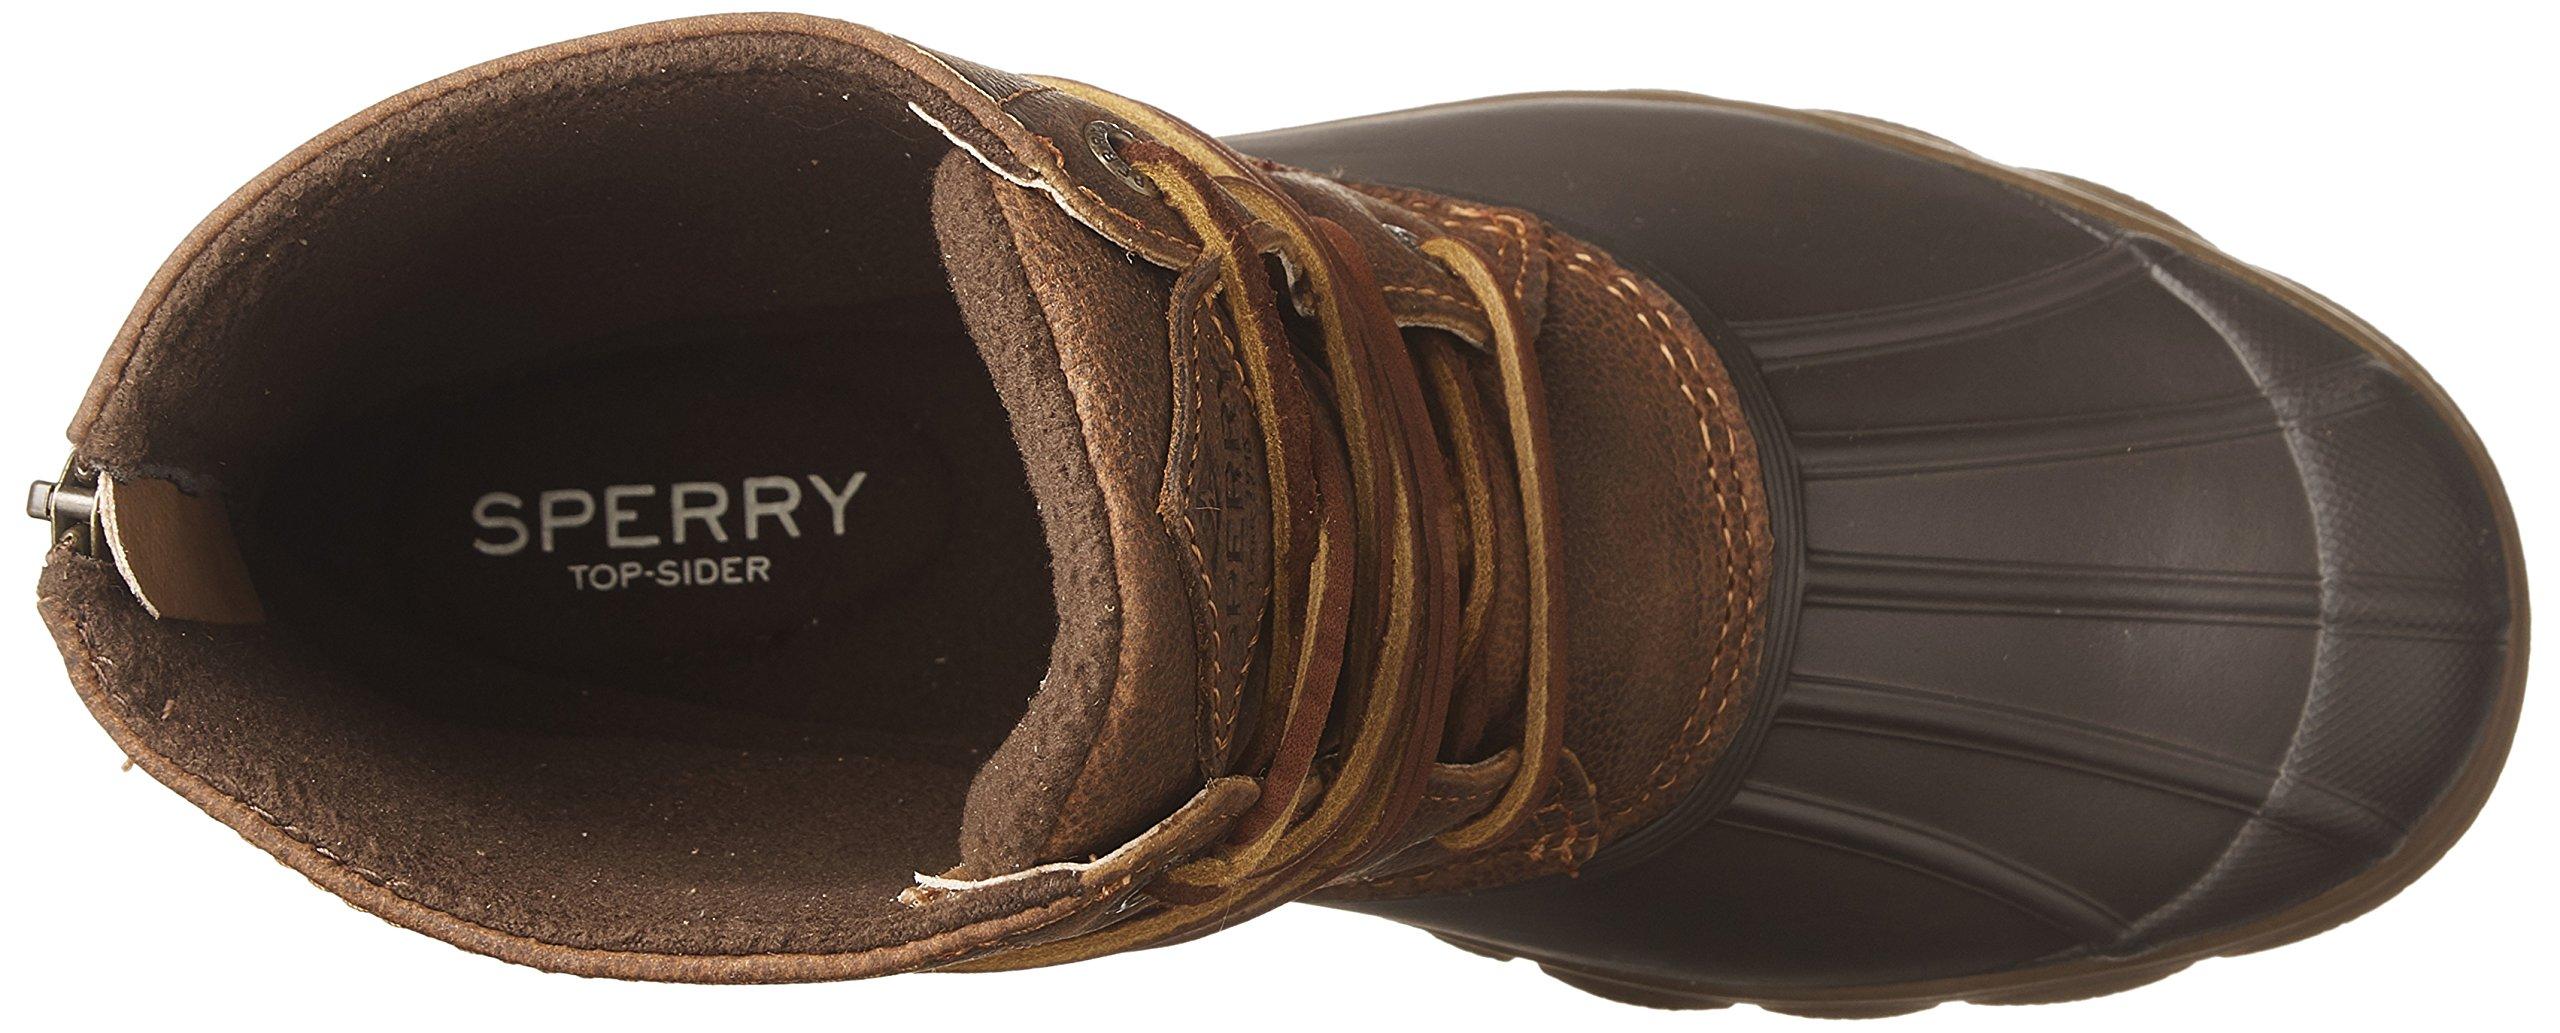 Sperry Top-Sider Women's Saltwater Wedge Tide Rain Boot, Brown/Tan, 11 Medium US by Sperry Top-Sider (Image #8)